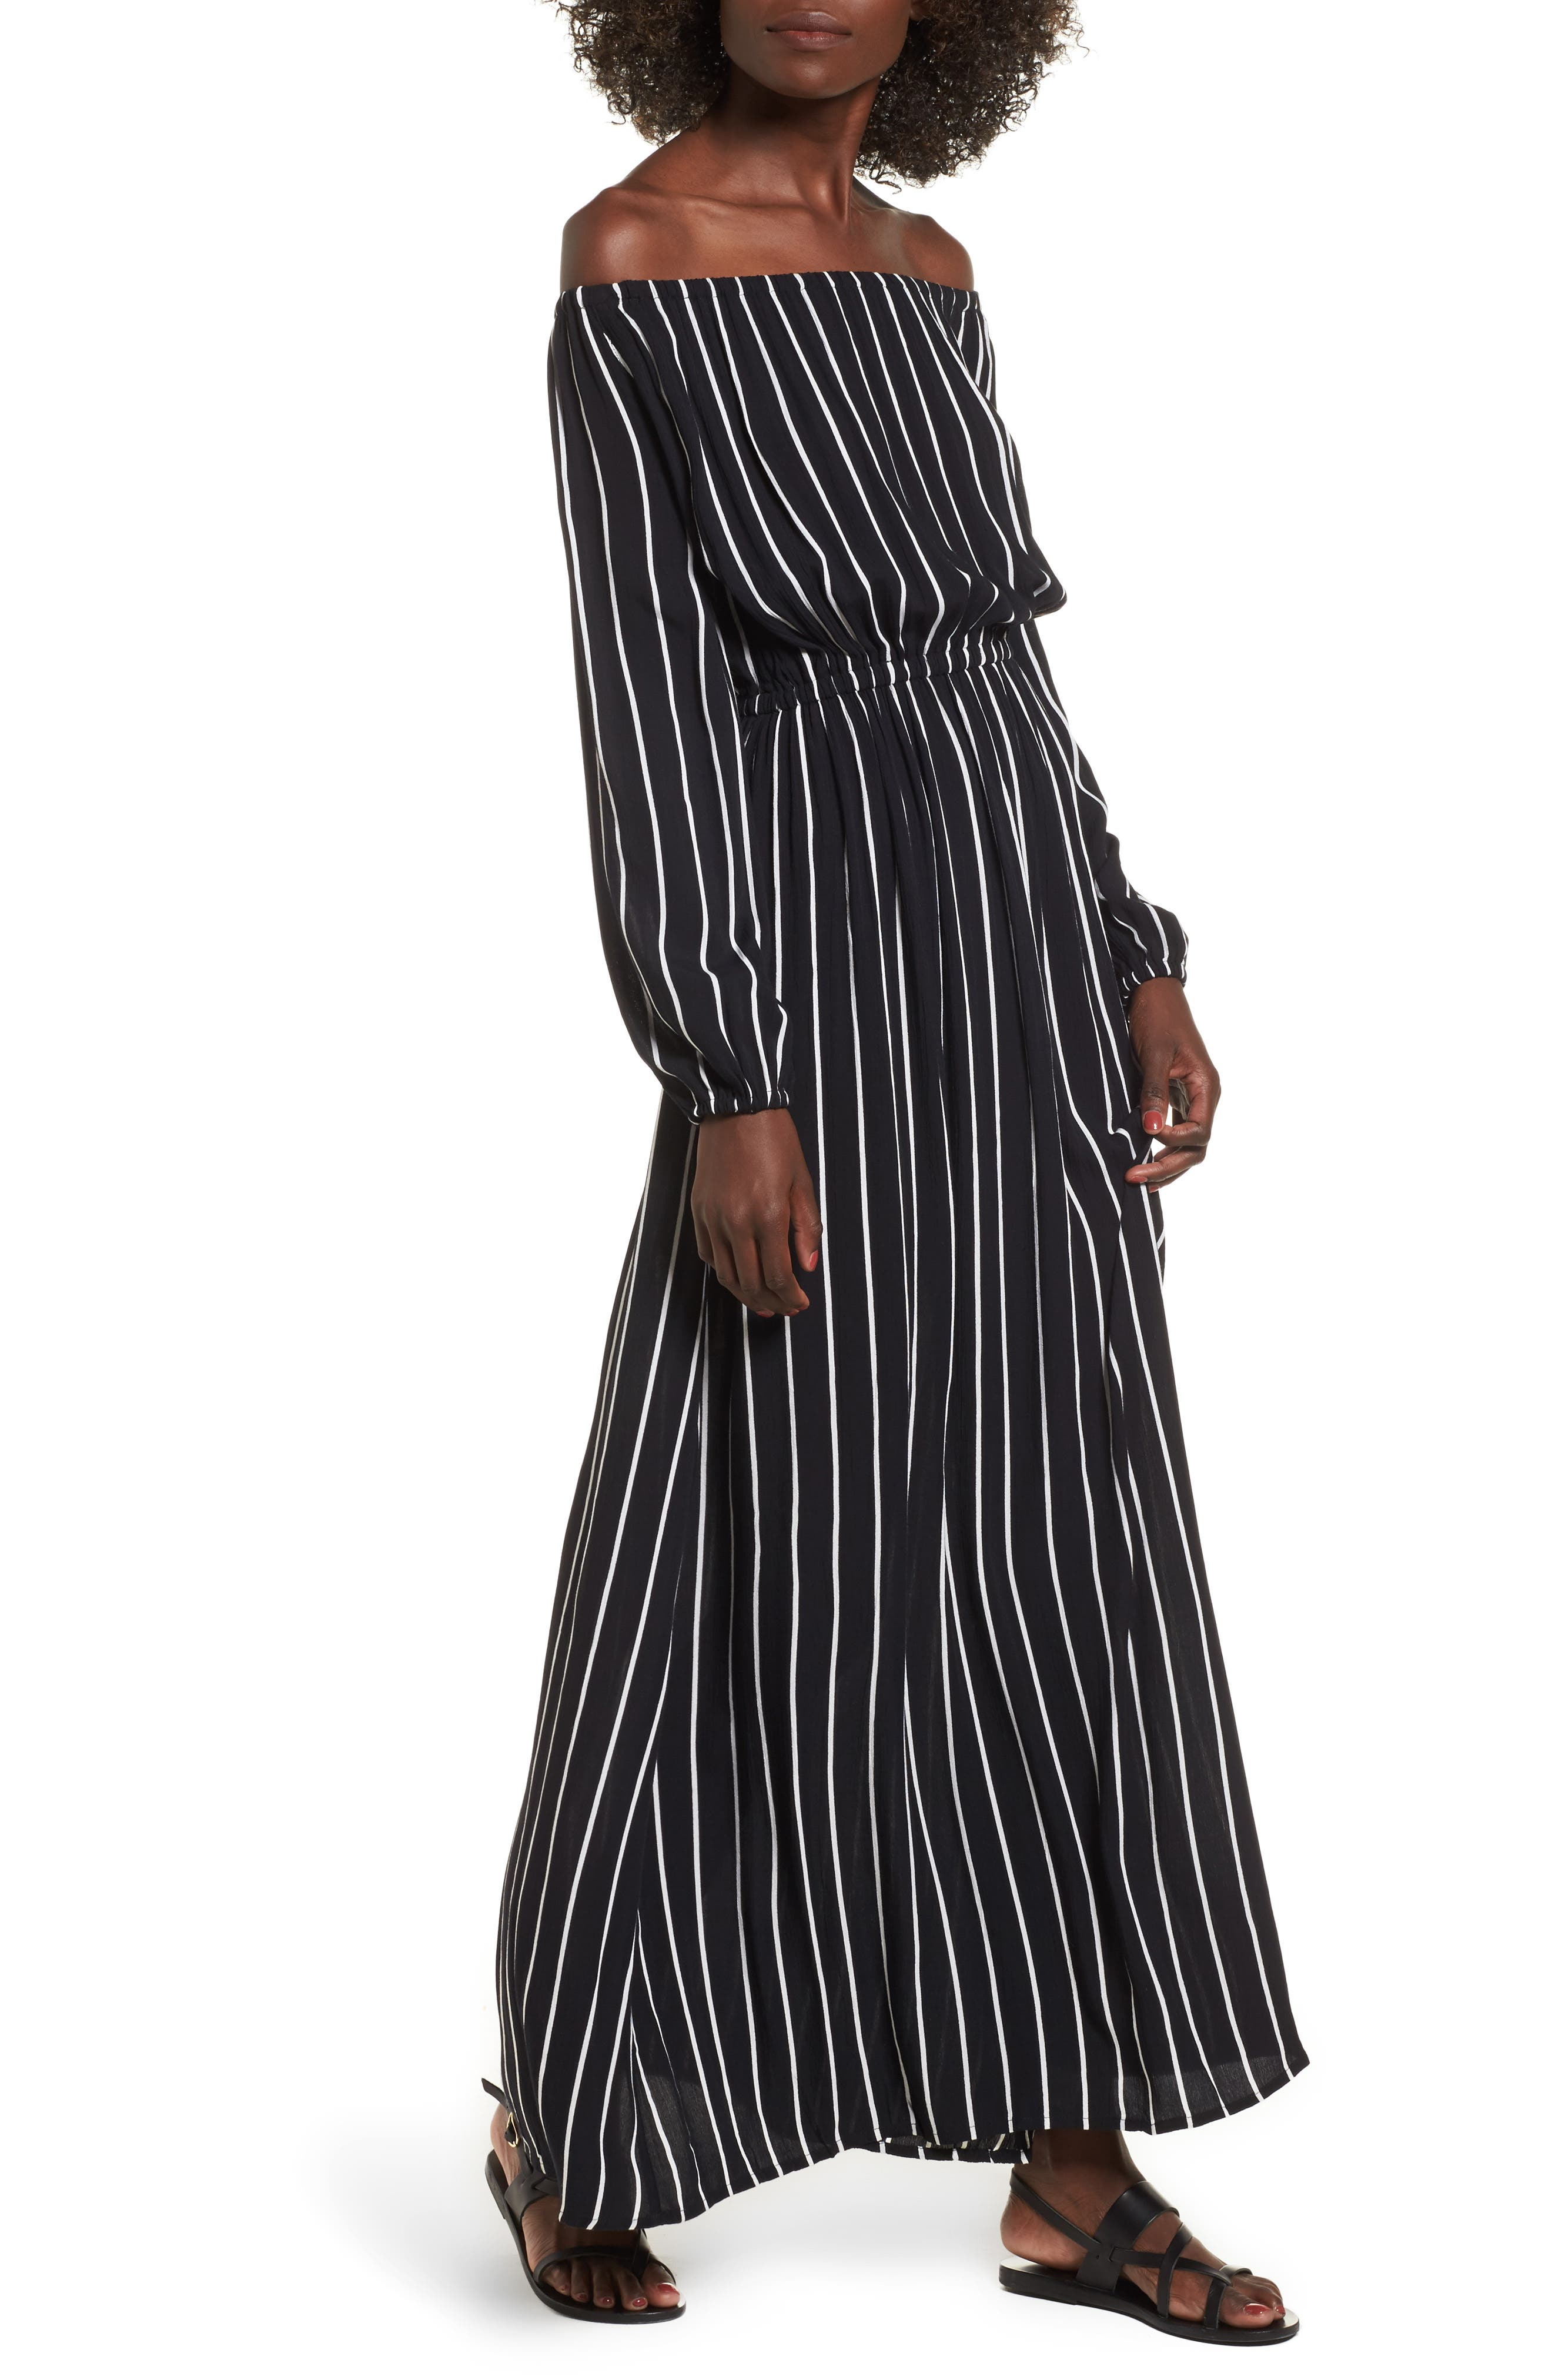 Crystal Ball Off the Shoulder Maxi Dress,                         Main,                         color, 001